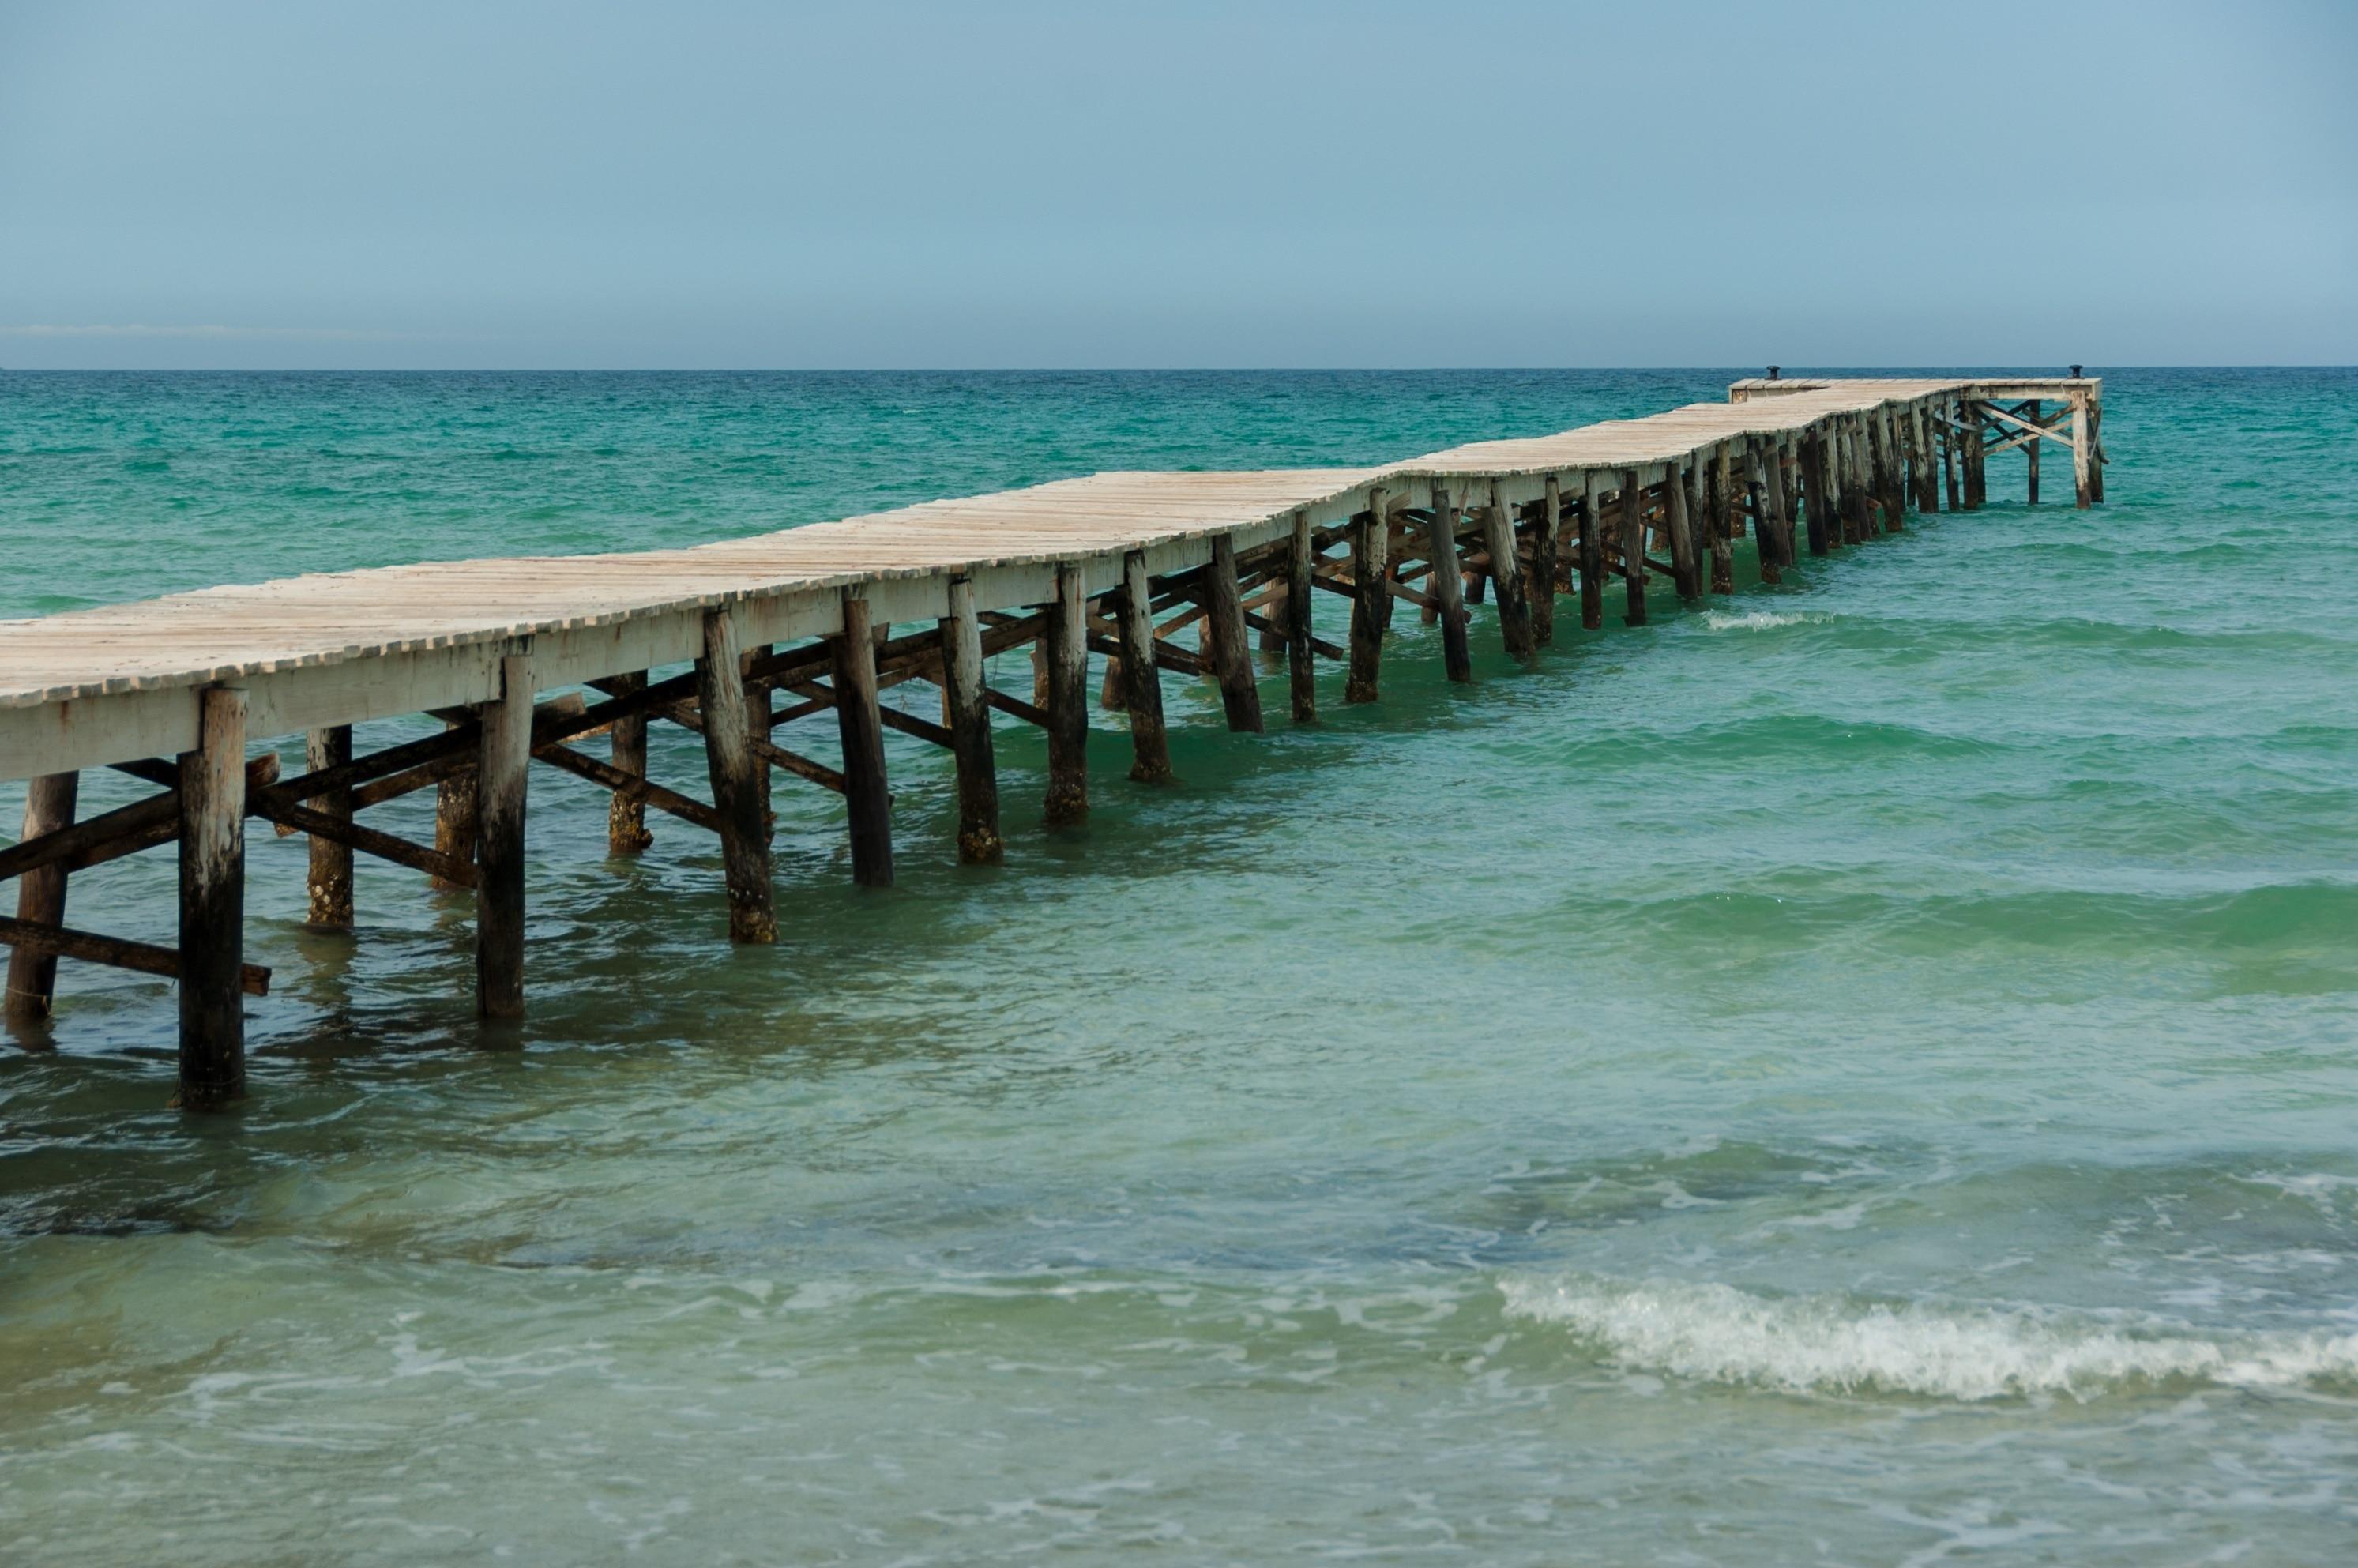 Playa de Muro, Balearic Islands, Spain